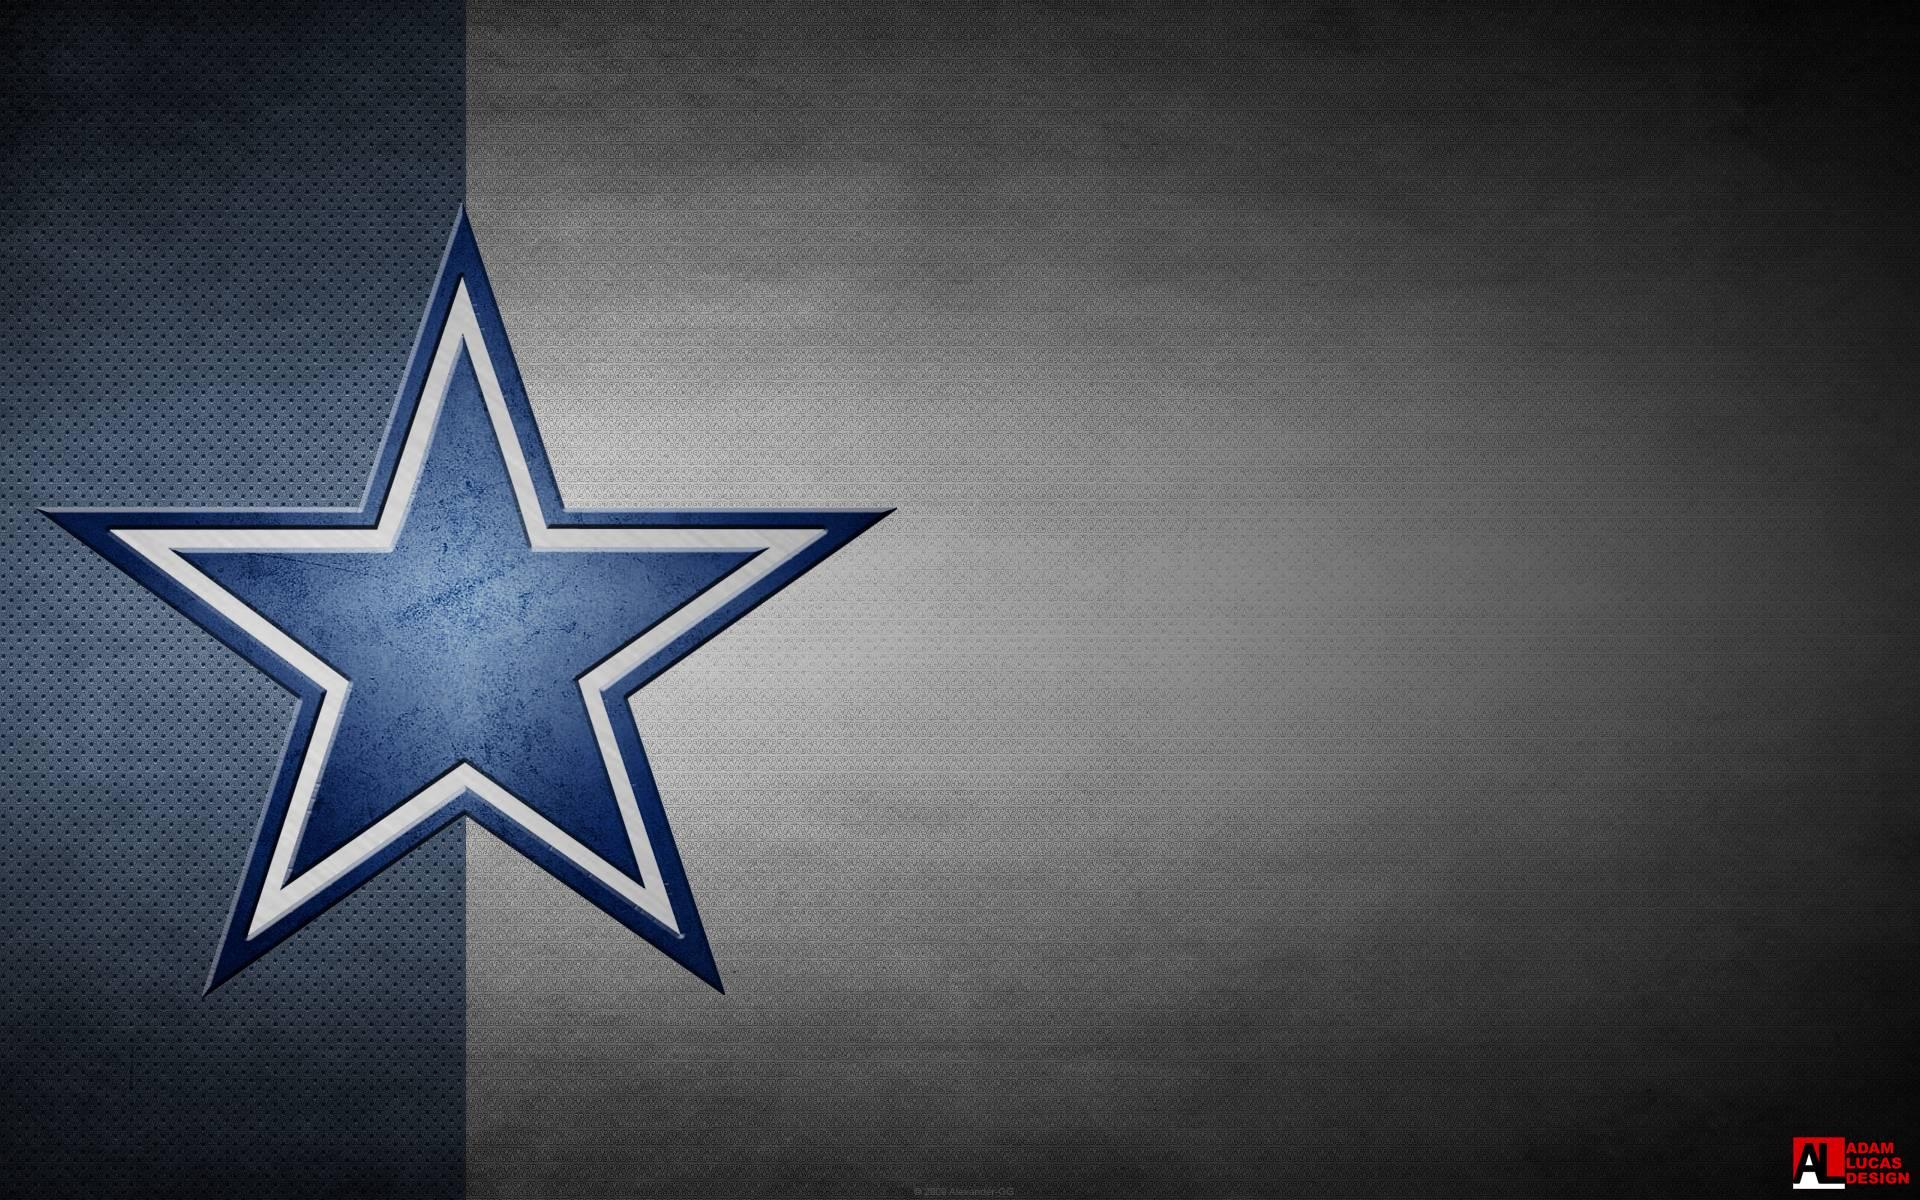 "1920x1200 Dallas Cowboys Image Wallpapers""> · Download · 999x799 ..."